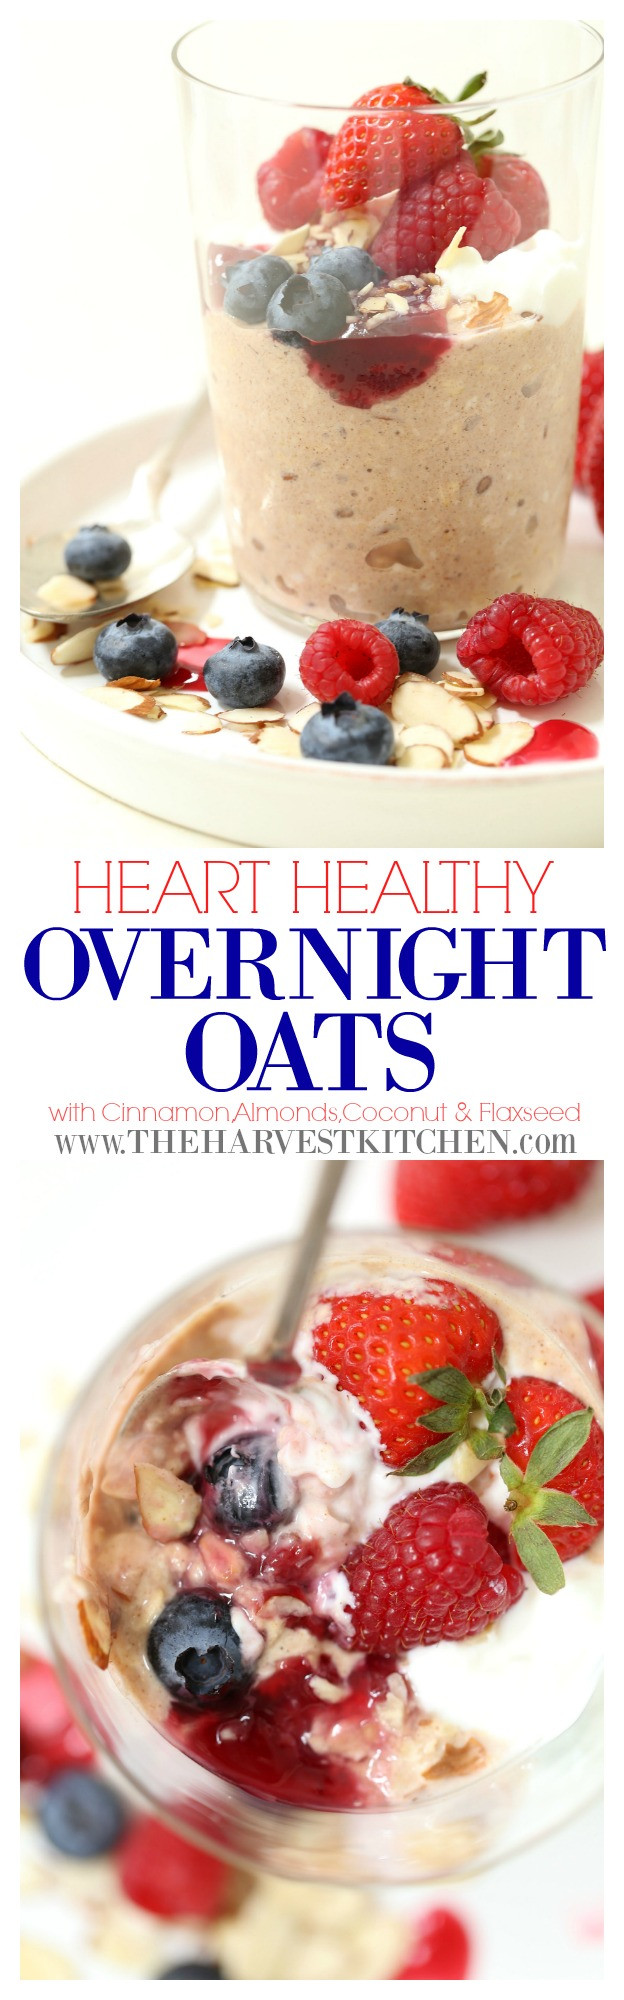 Heart Healthy Breakfast  Heart Healthy Overnight Oats The Harvest Kitchen